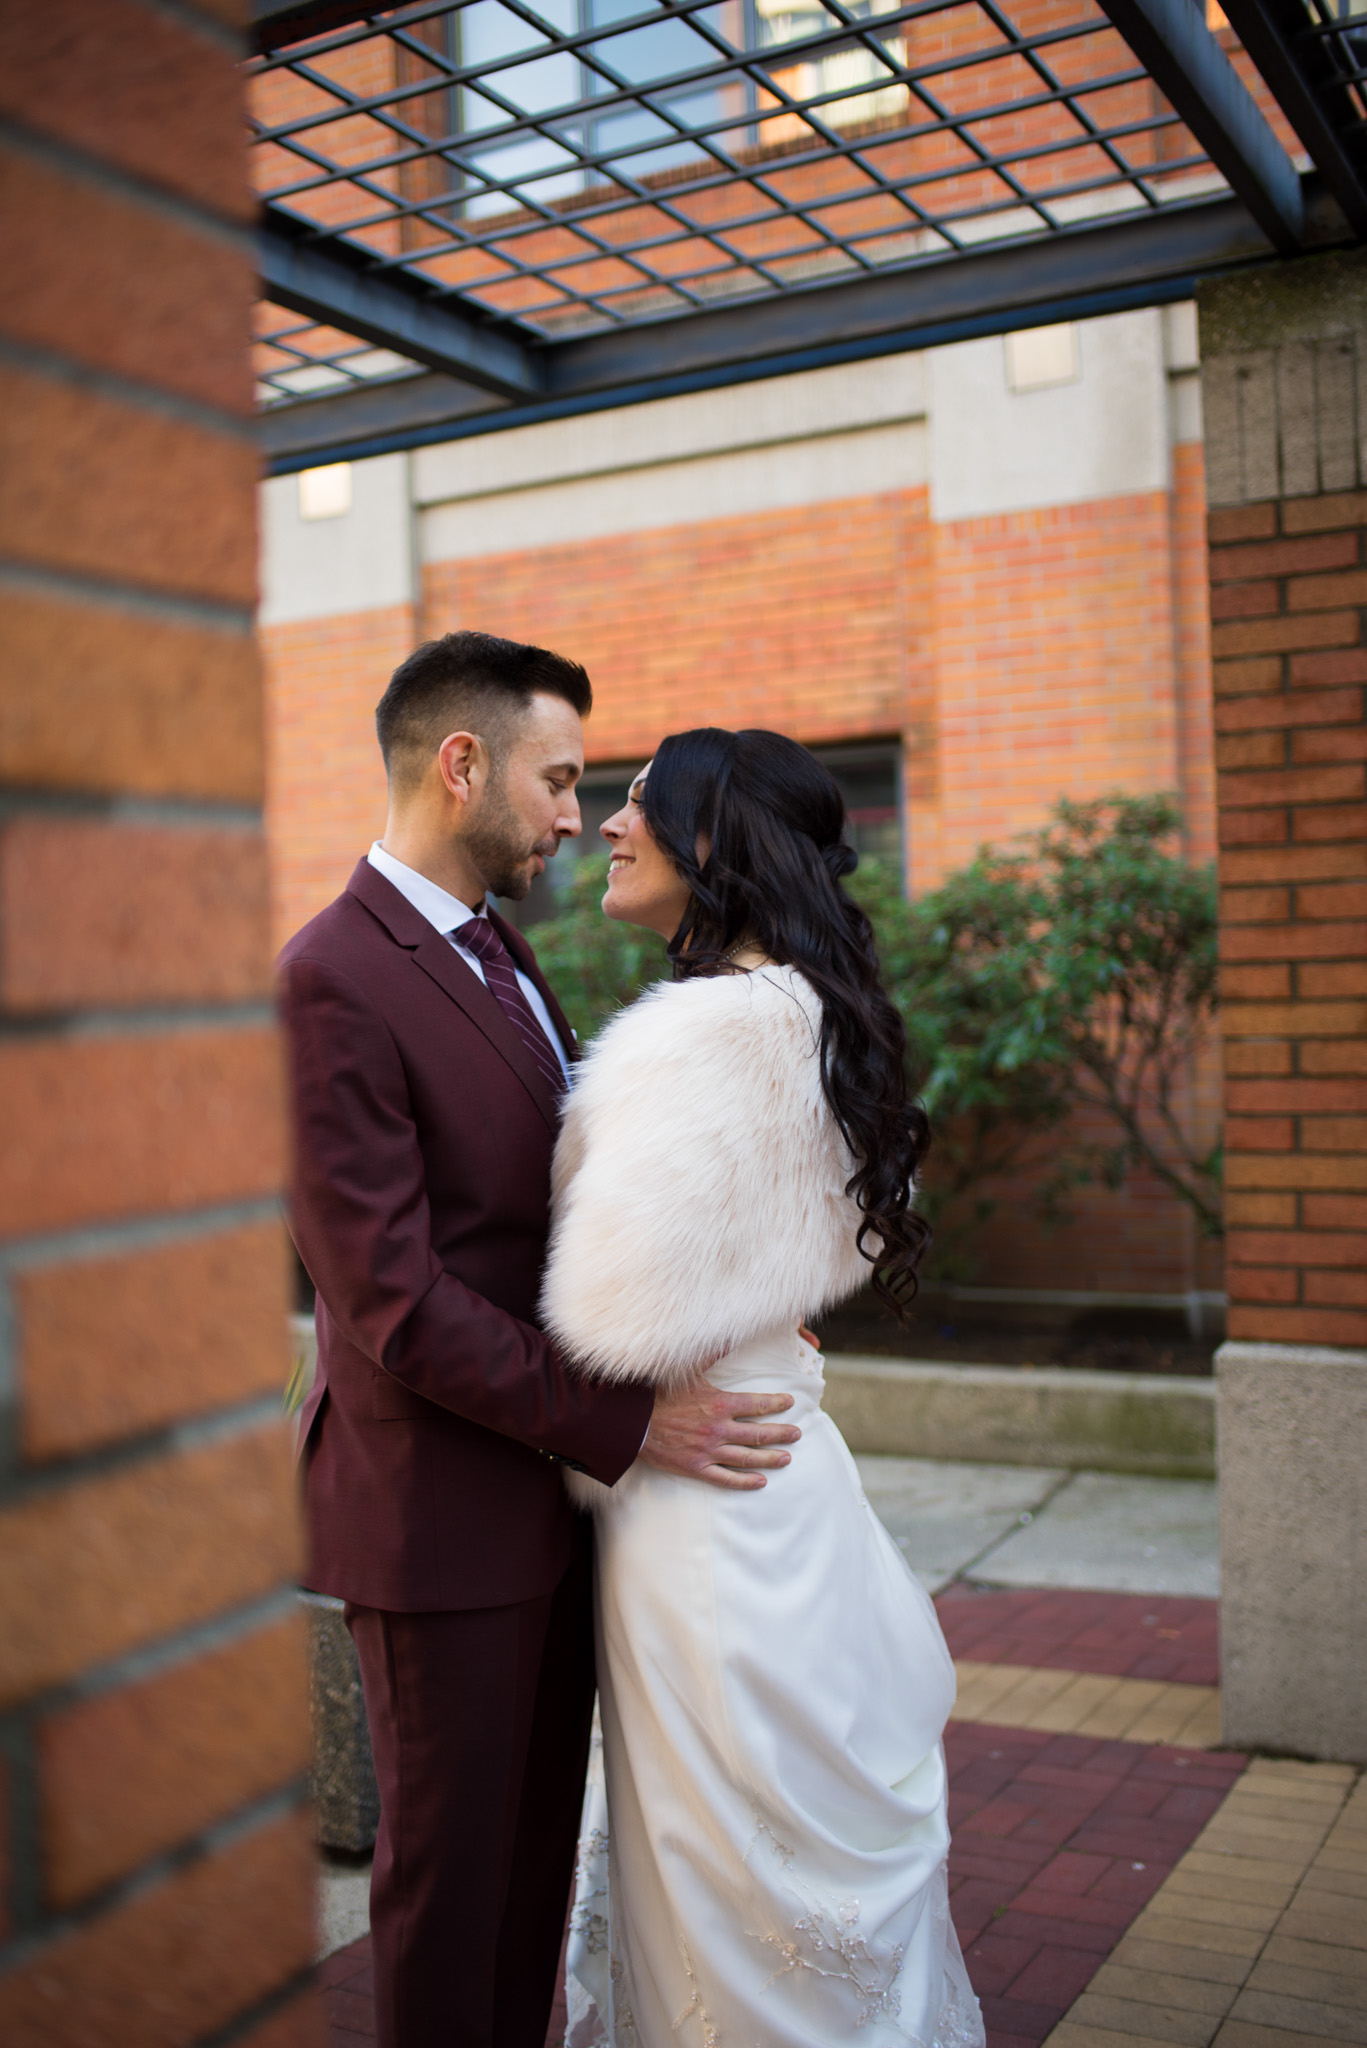 Brix and Mortar Wedding Photos-24.jpg